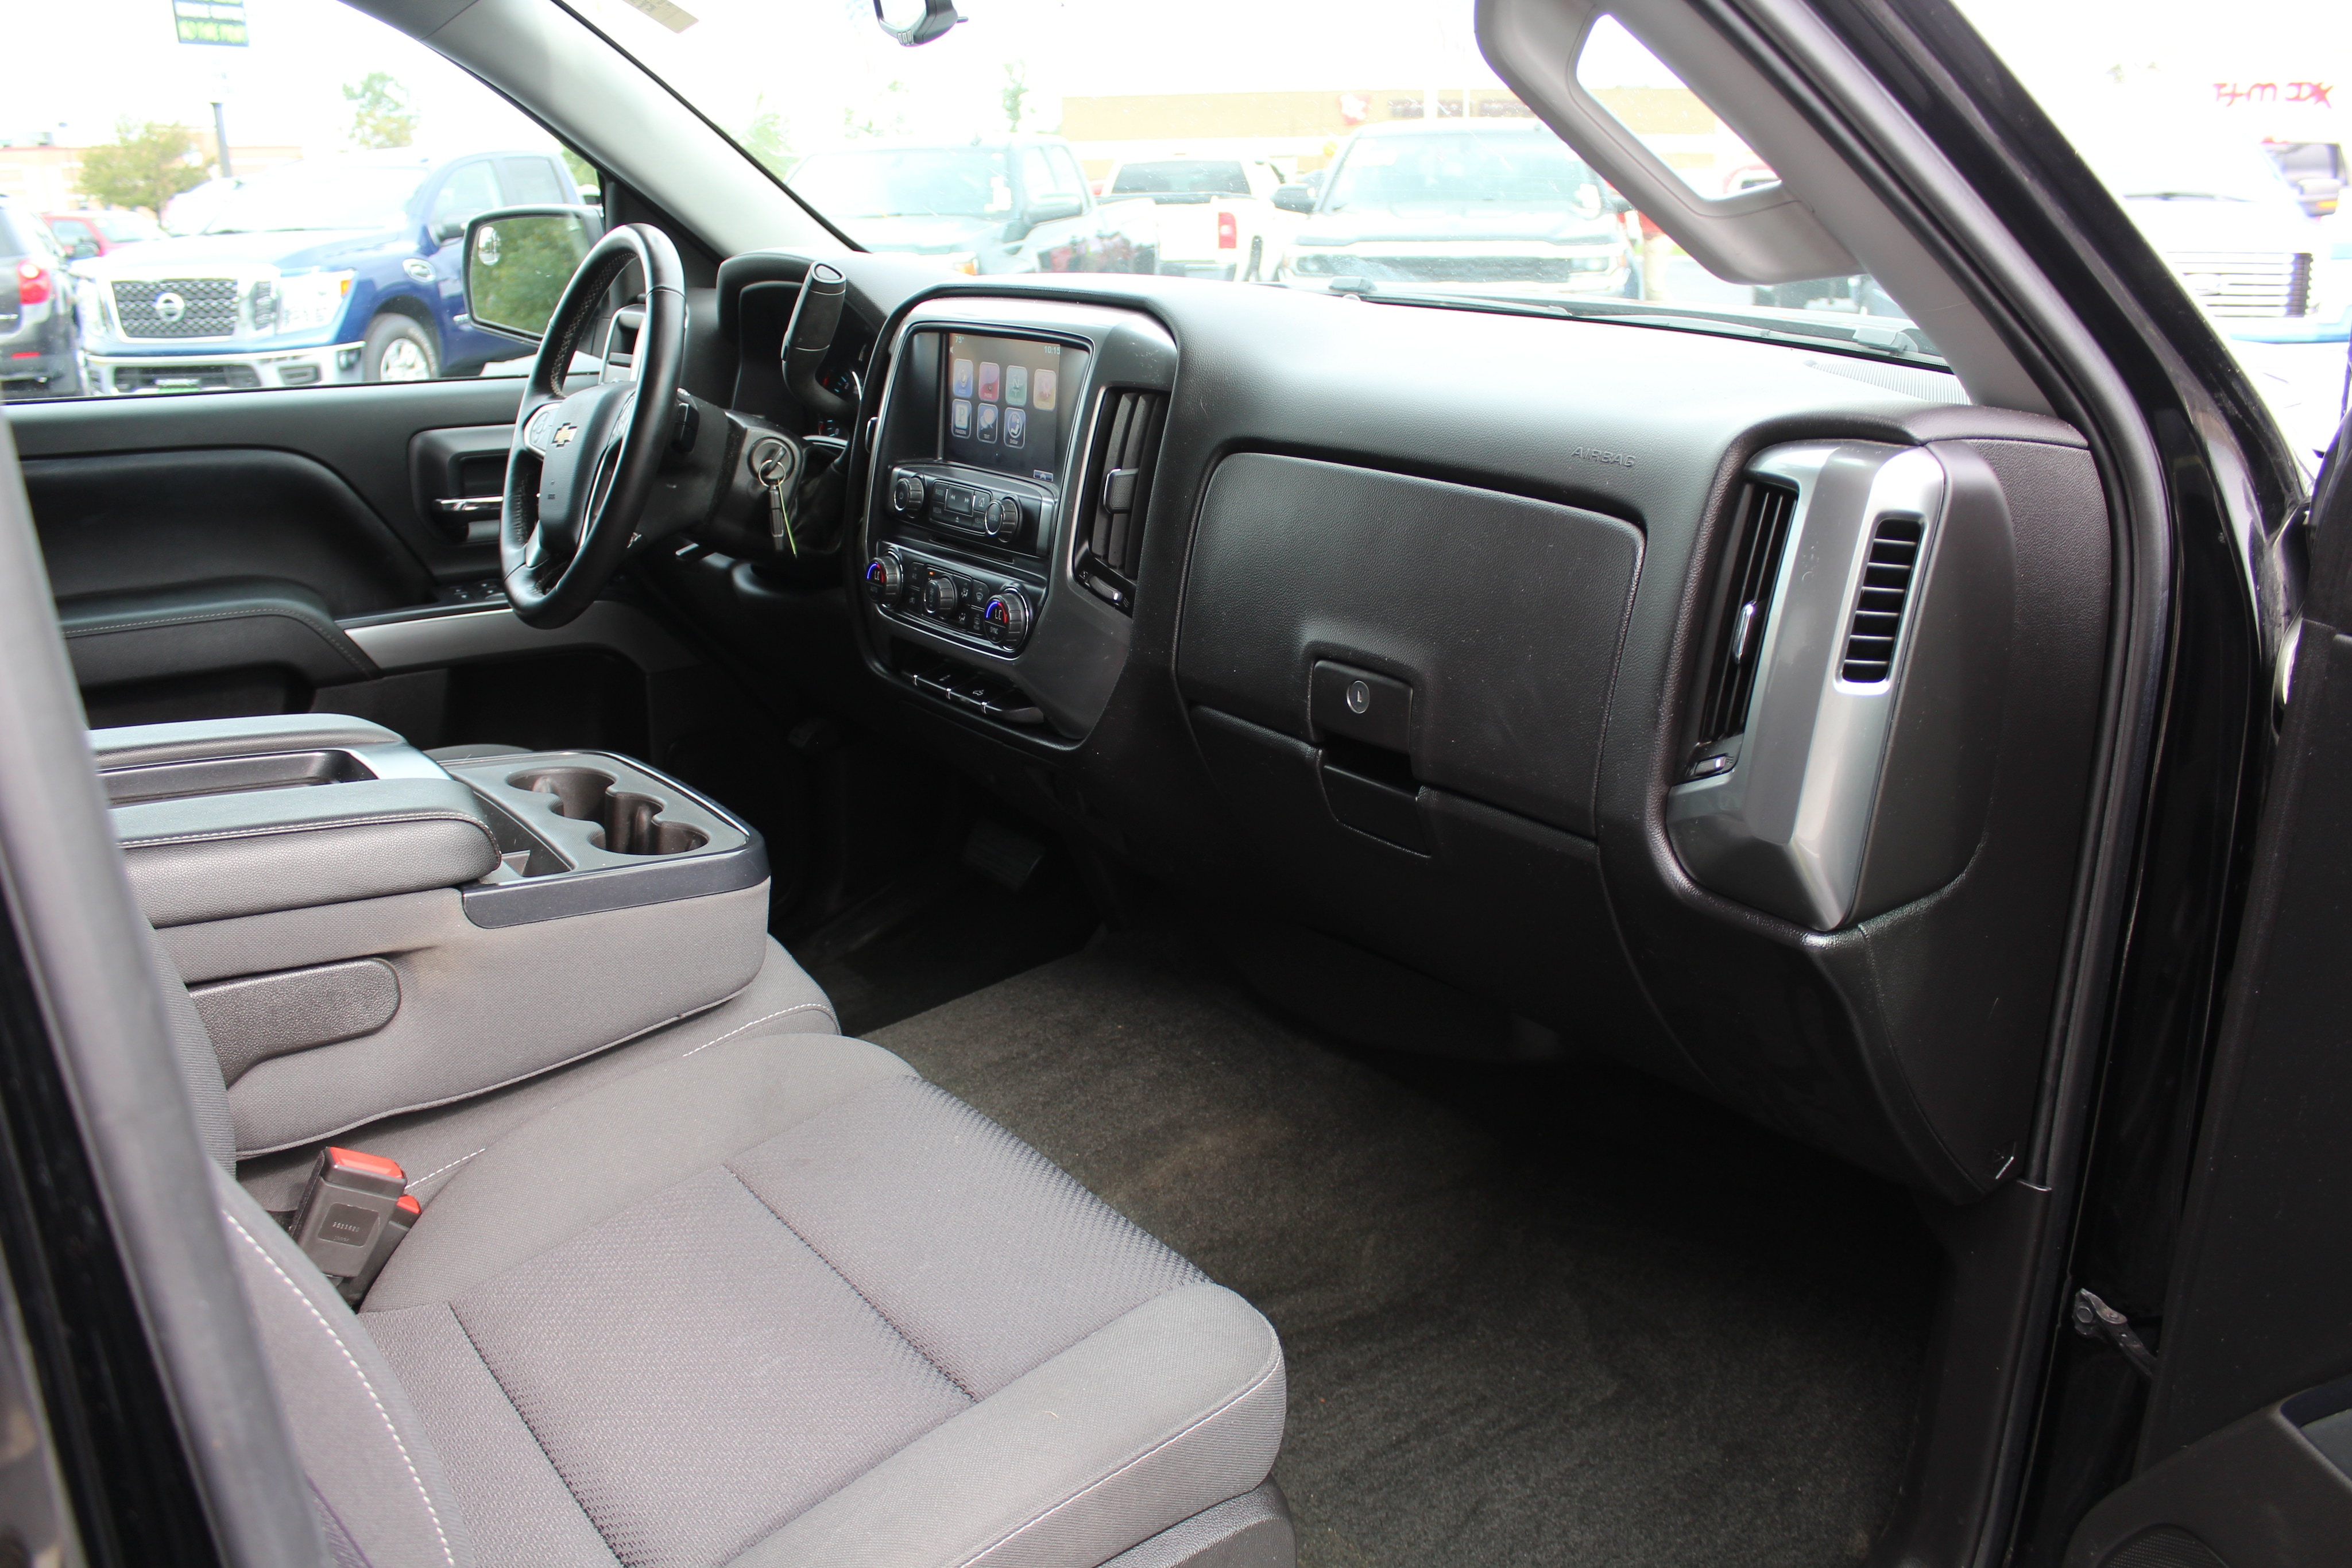 2016 Chevrolet Silverado 1500 Extended Cab Pickup